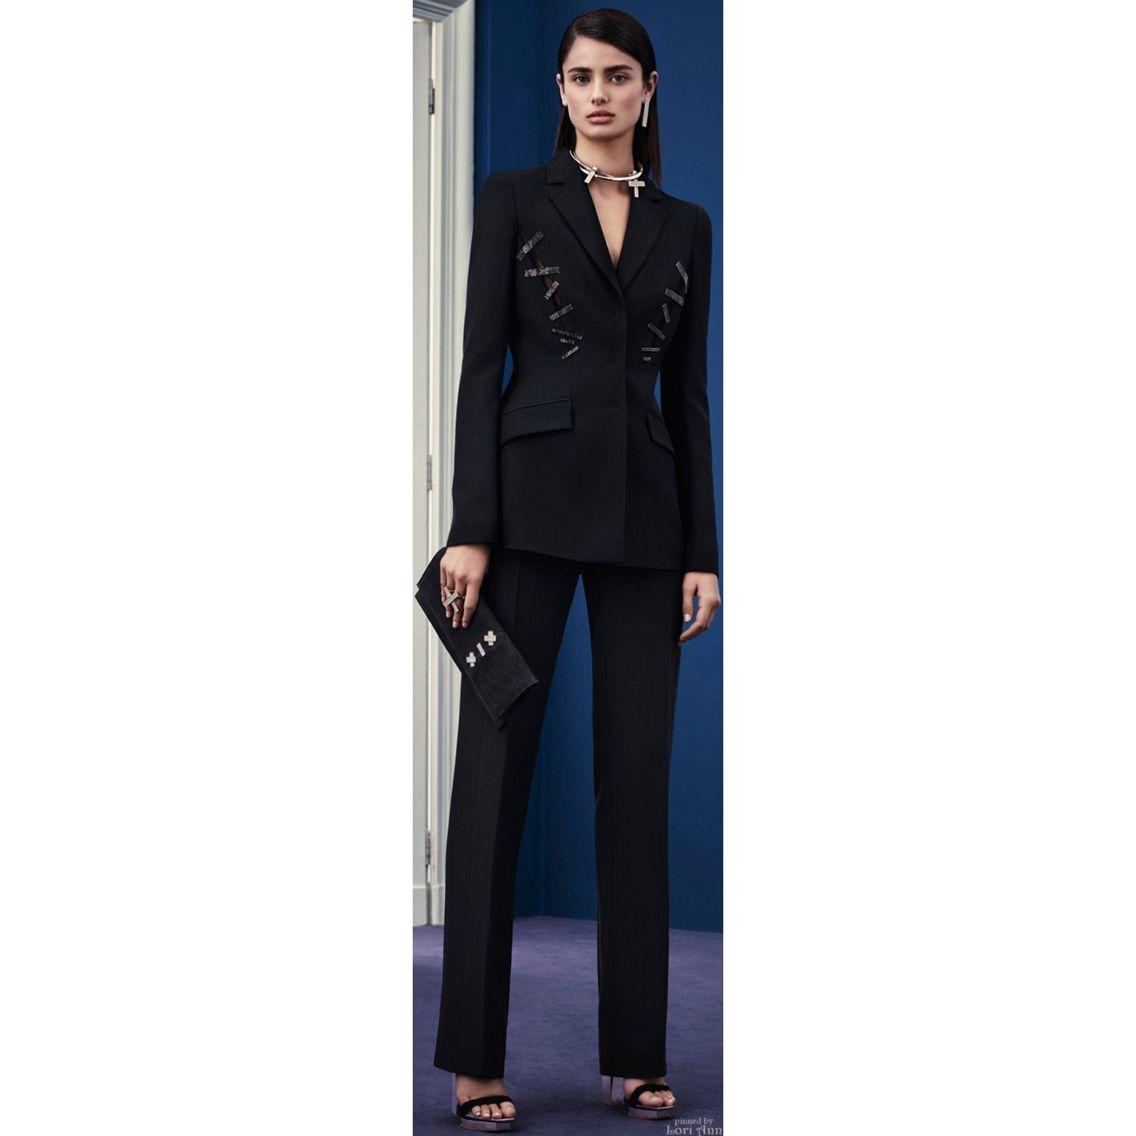 Versace : fashion tumblr